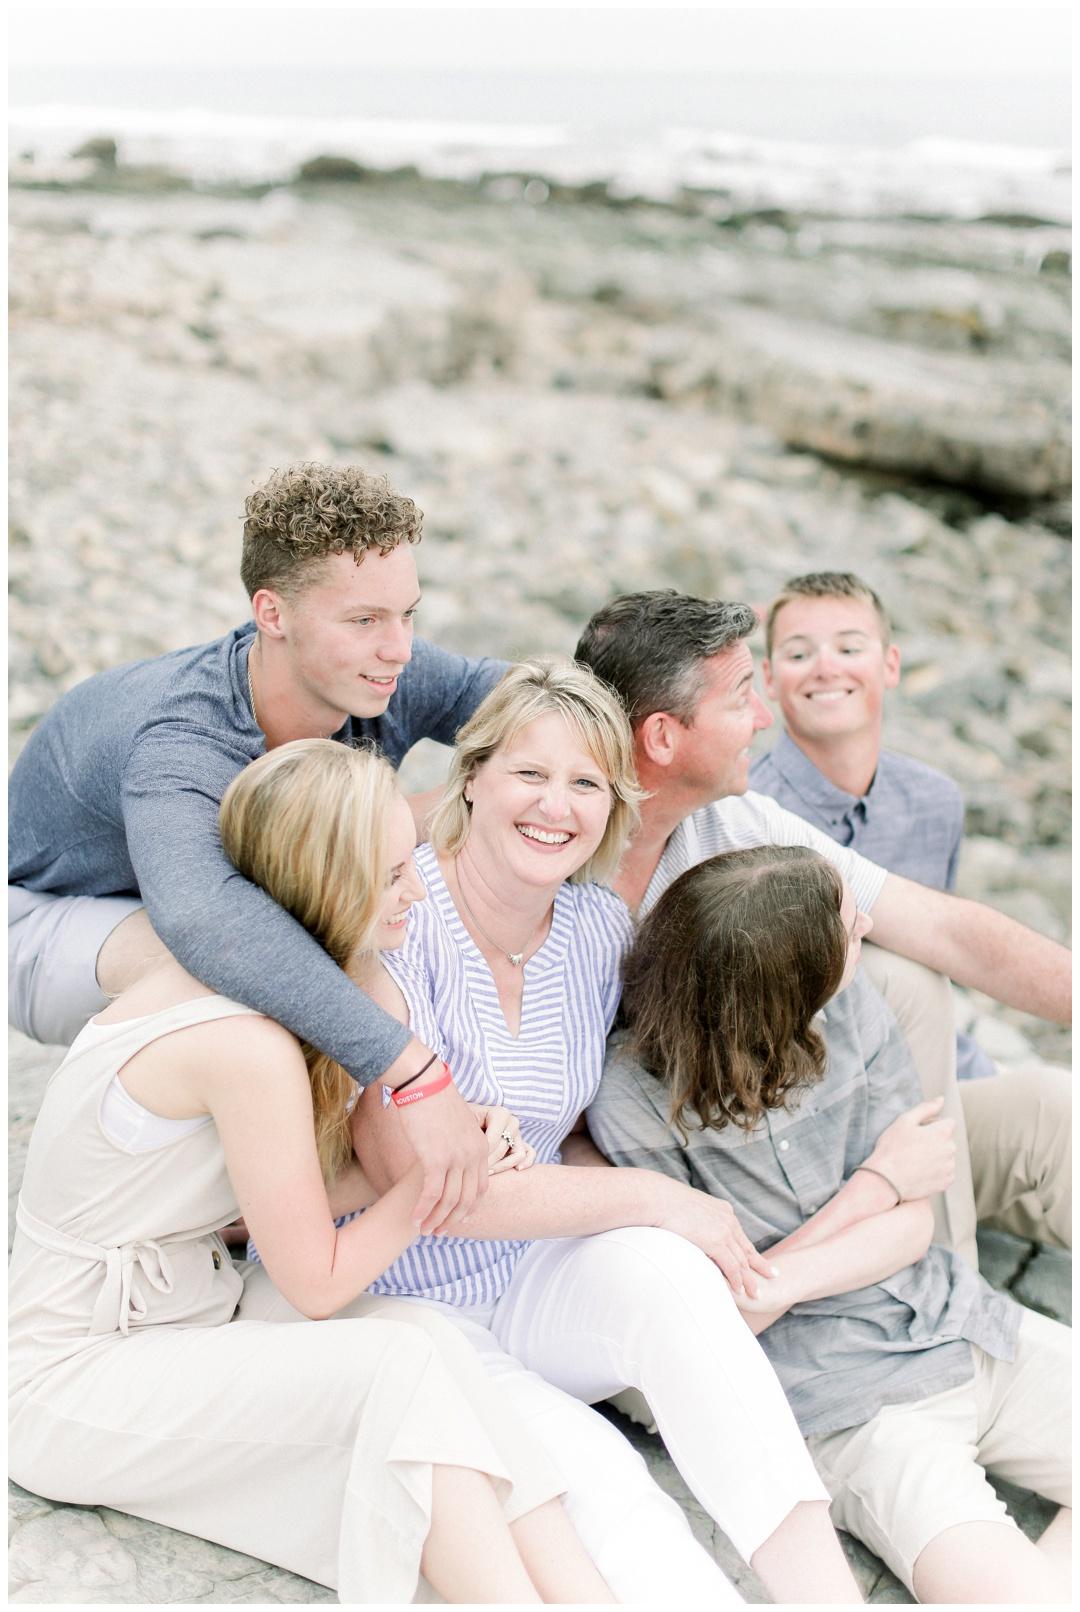 Newport_Beach_Family_Photographer_Orange_County_Family_Photography_Cori_Kleckner_Photography_Orange_County_Family_Photographer_Beach_Family_Session__1219.jpg